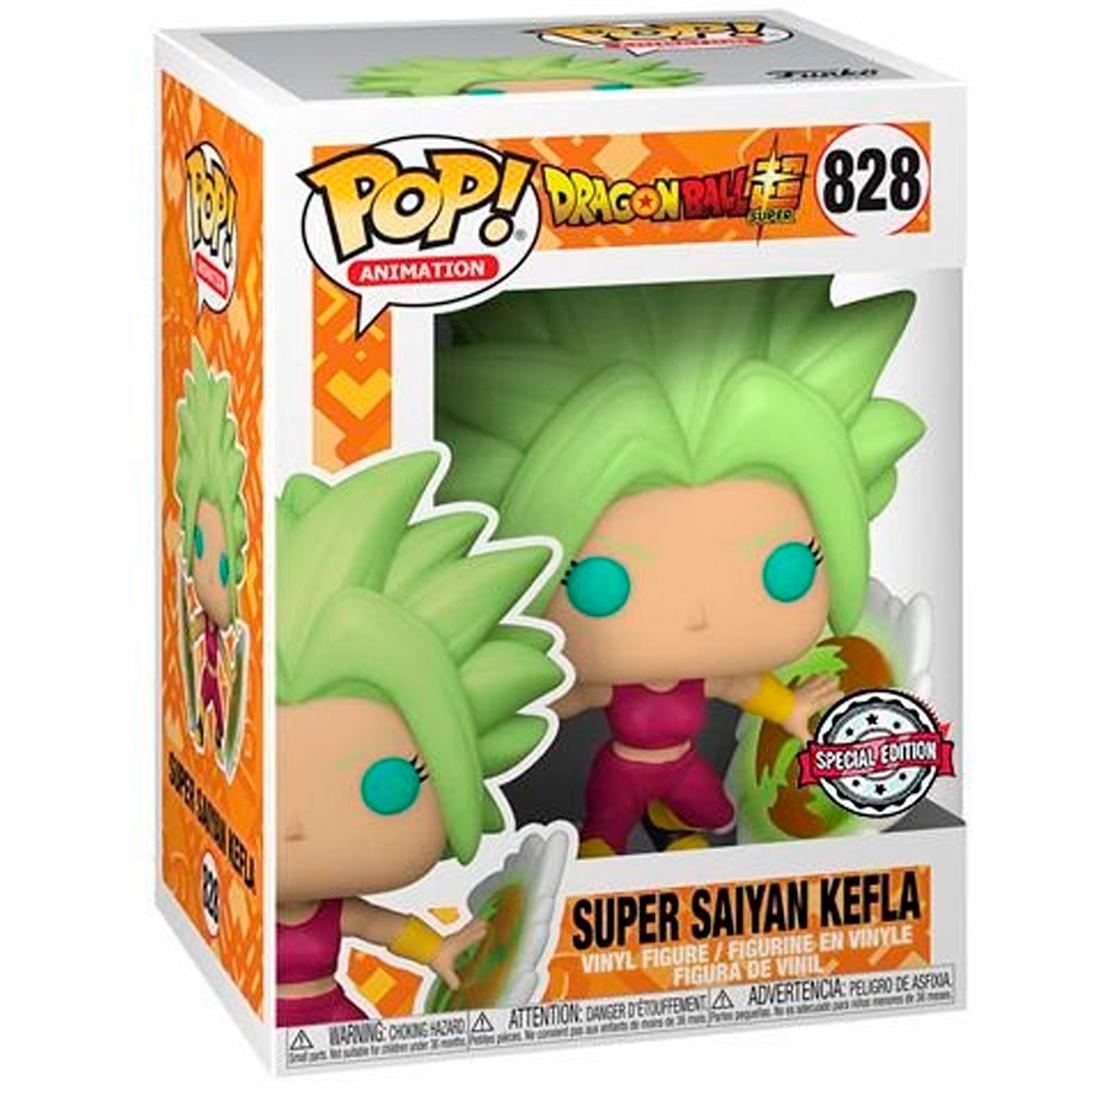 Funko Pop Television Dragon Ball Super 828 Super Saiyan Kefla Special Edition